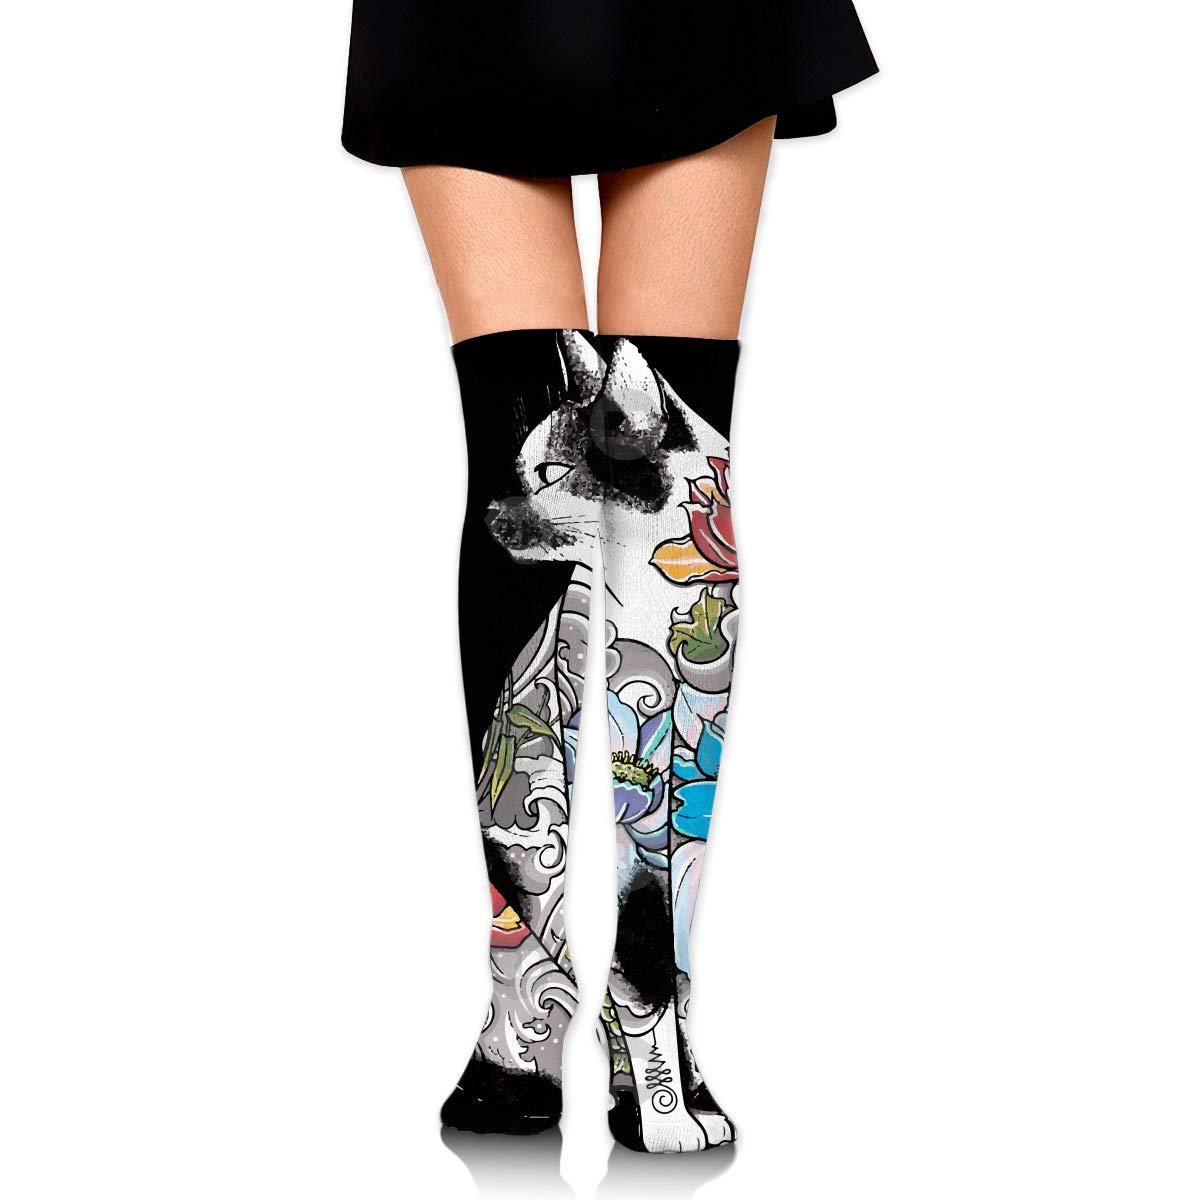 Womens//Girls Beautiful Kitty Casual Socks Dresses Over The Knee High Socks 23.6